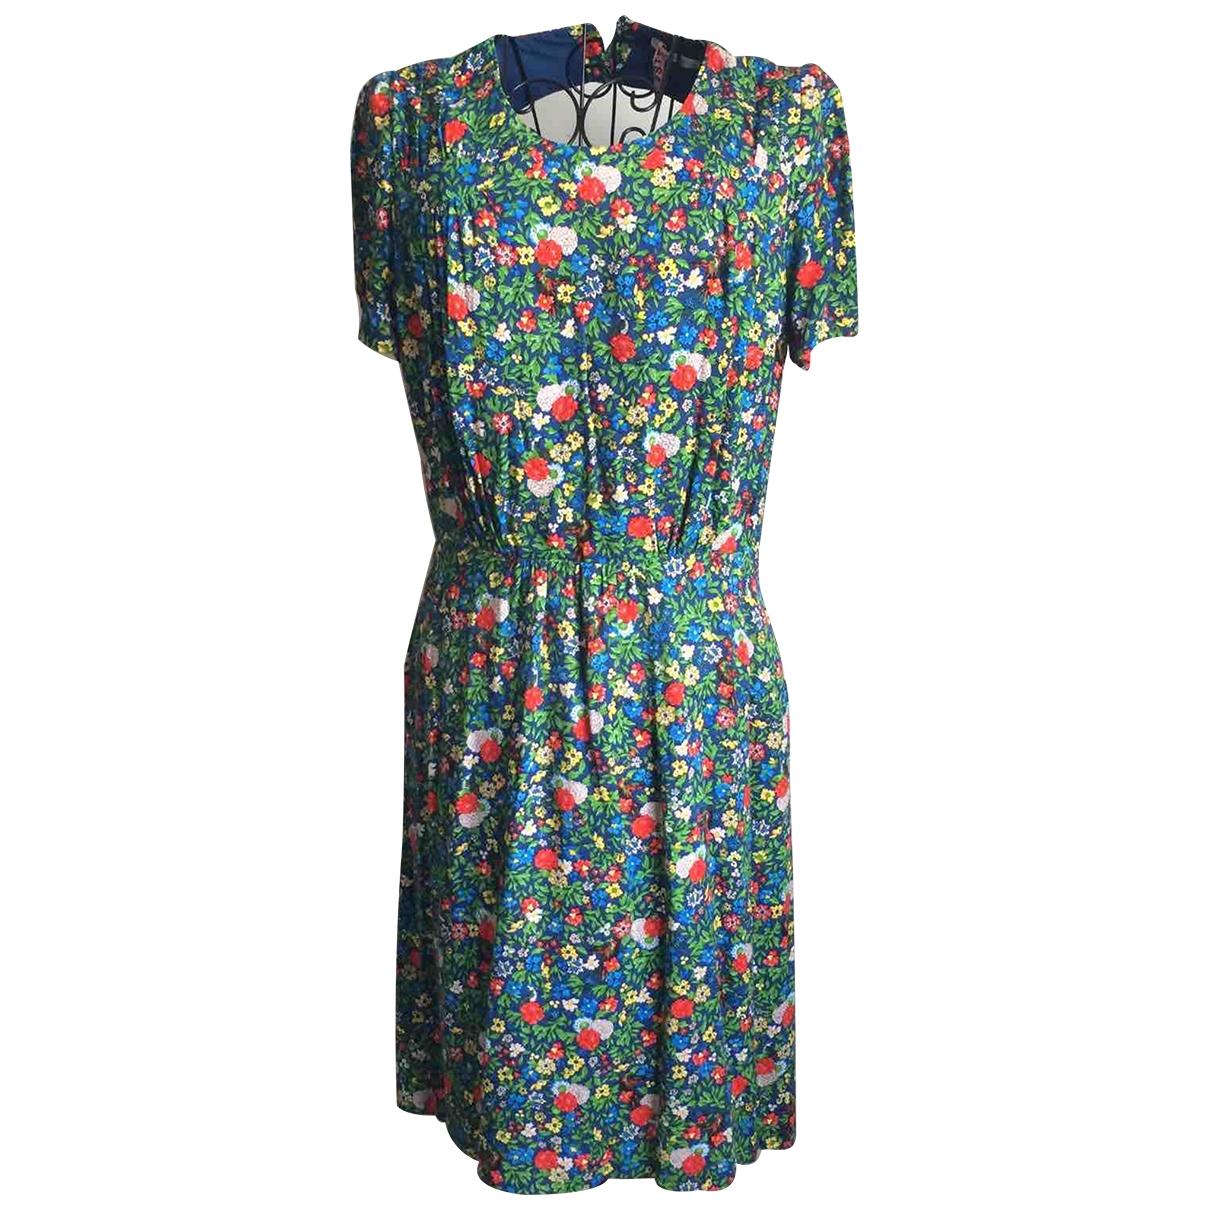 Bimba Y Lola \N Cotton dress for Women S International